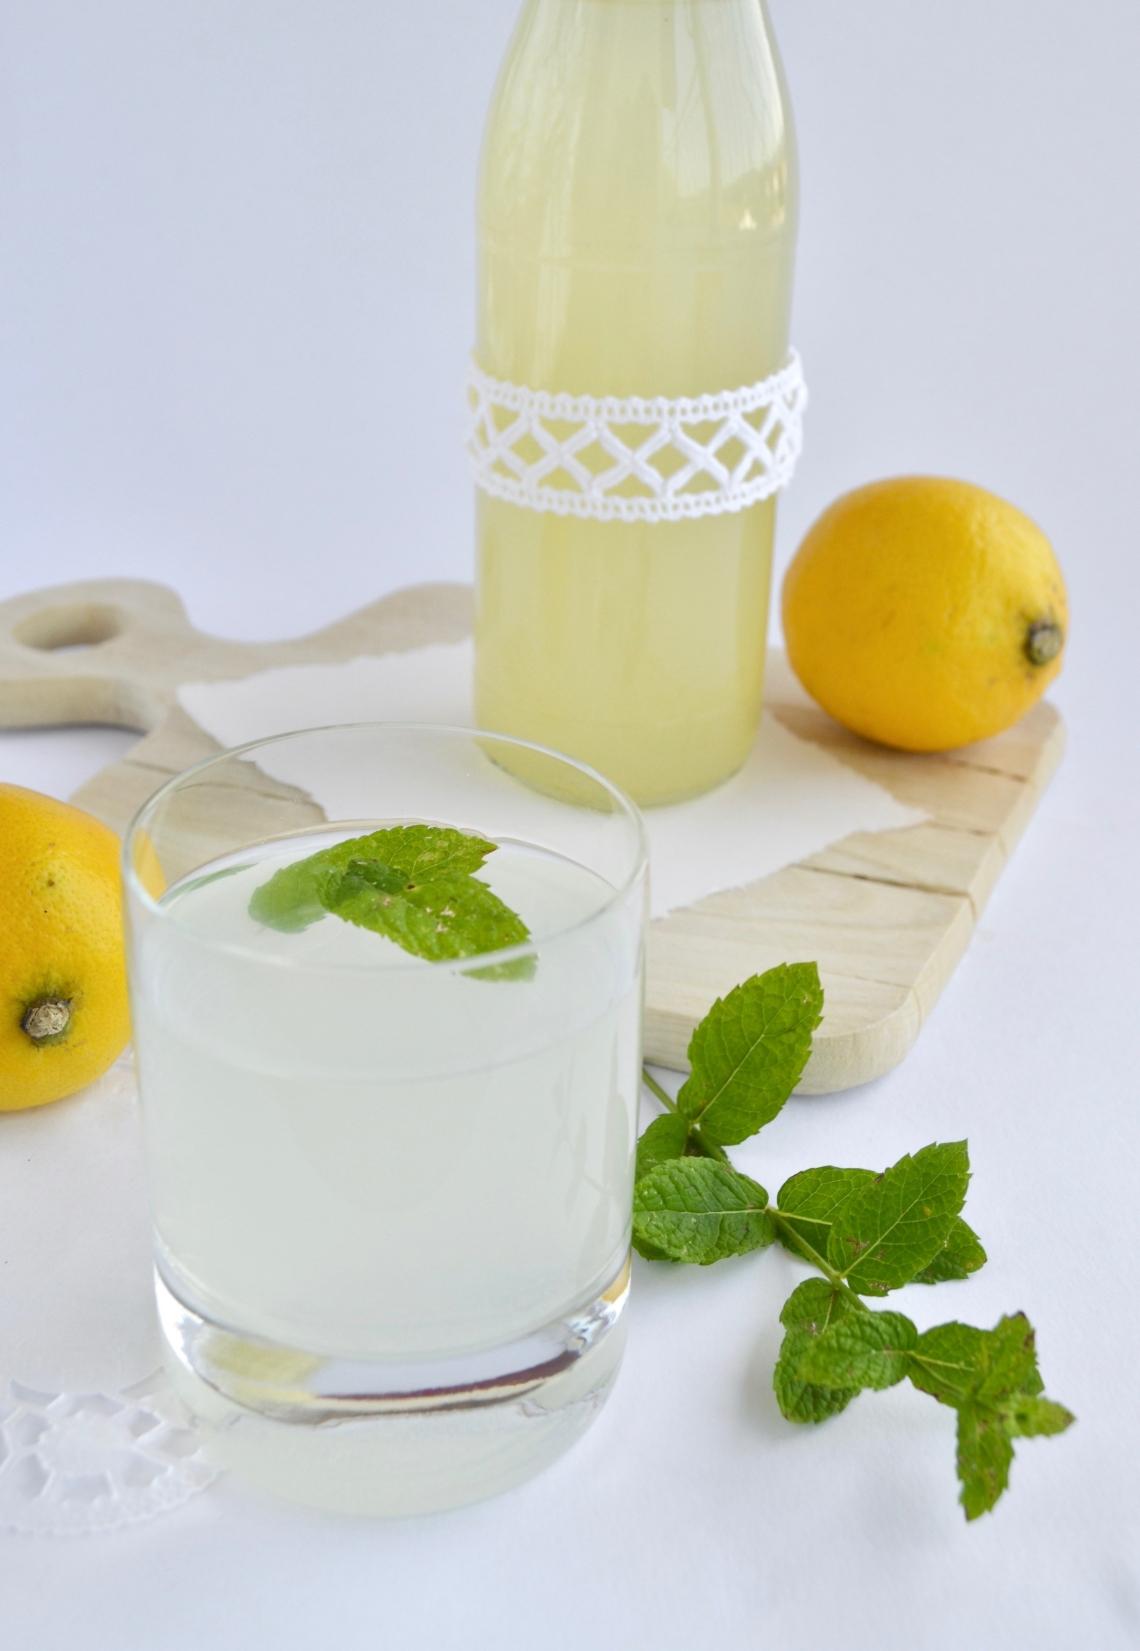 Zitronen-Minz-Sirup